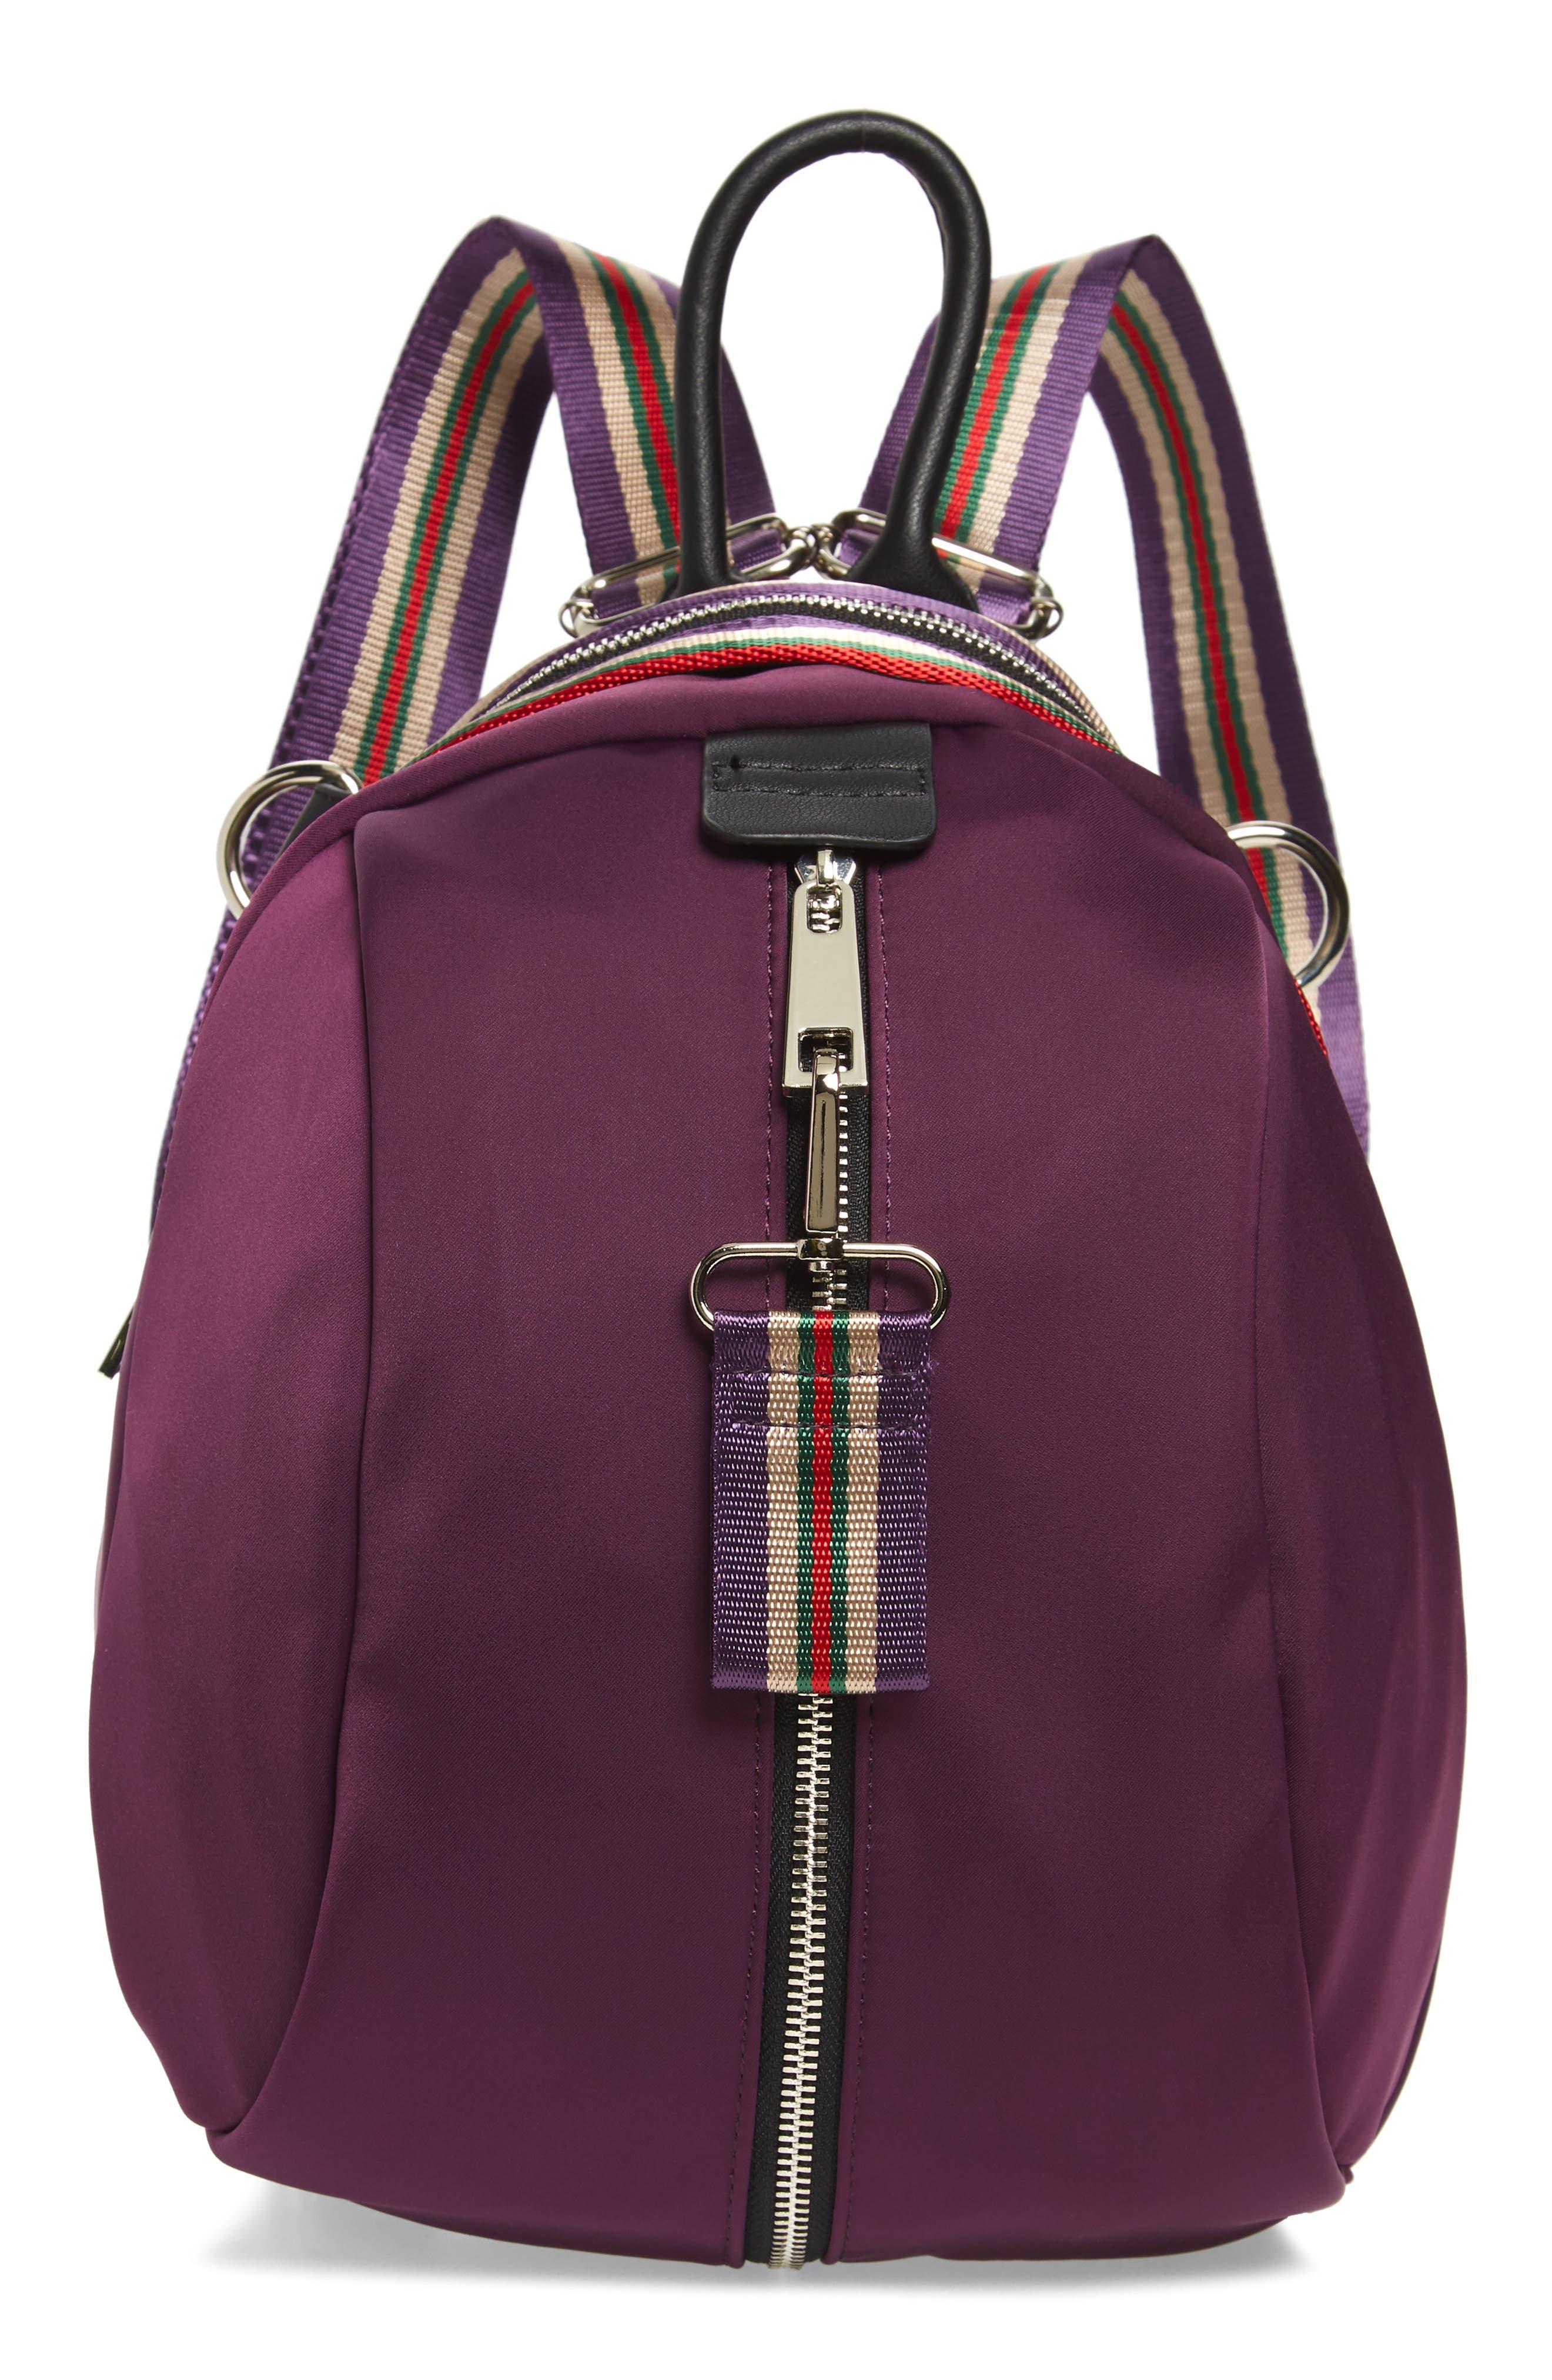 Satin Nylon & Webbing Convertible Backpack,                             Main thumbnail 1, color,                             PURPLE